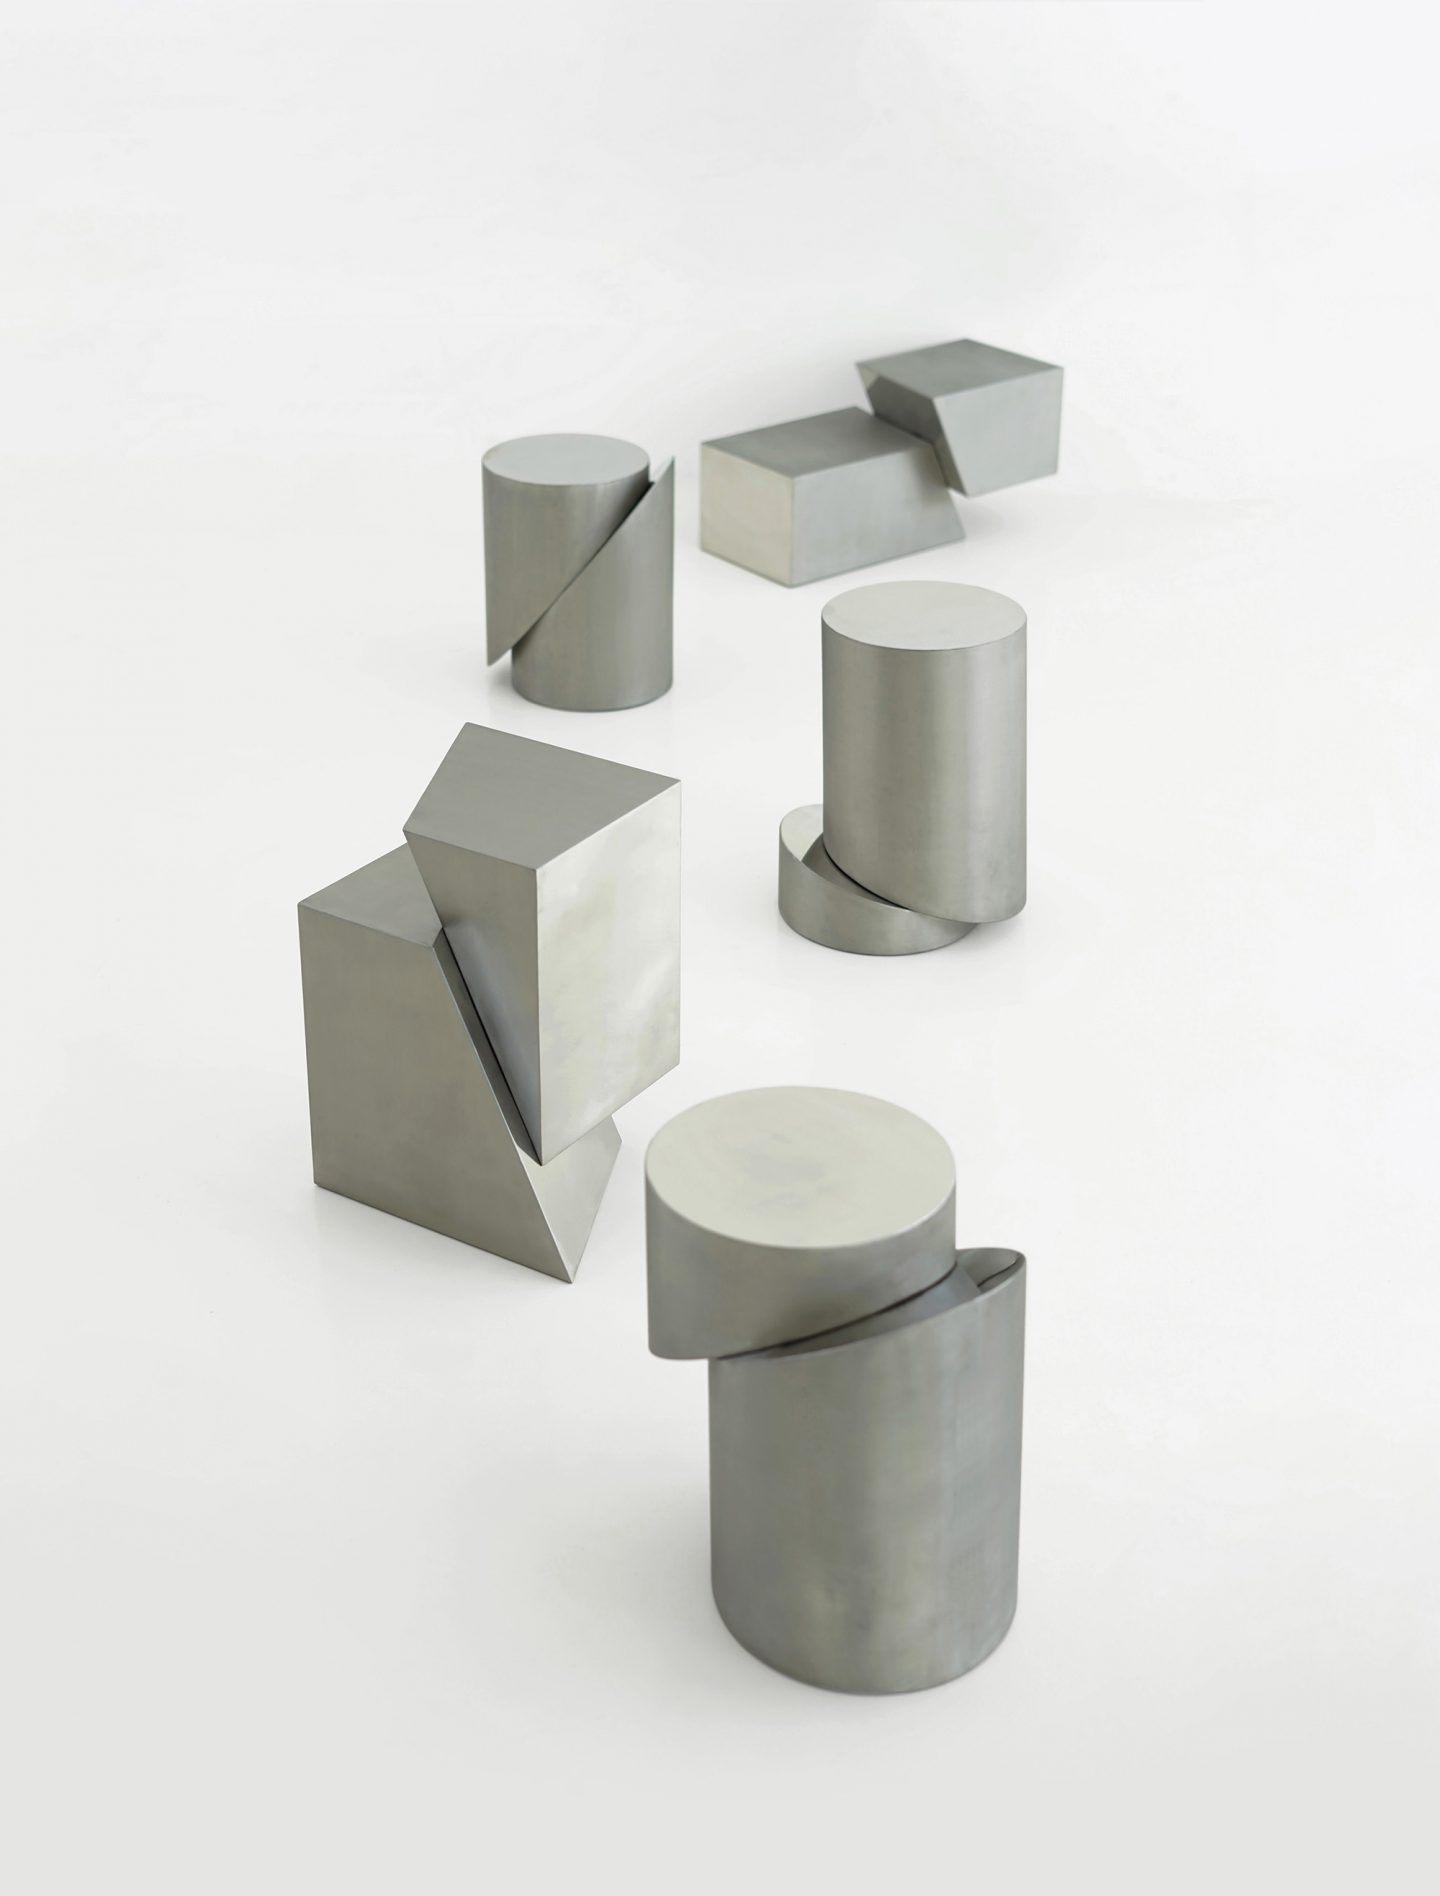 IGNANT-Design-Jeong-Ho-Ko-Hyongho-Park-Slice-Series-4